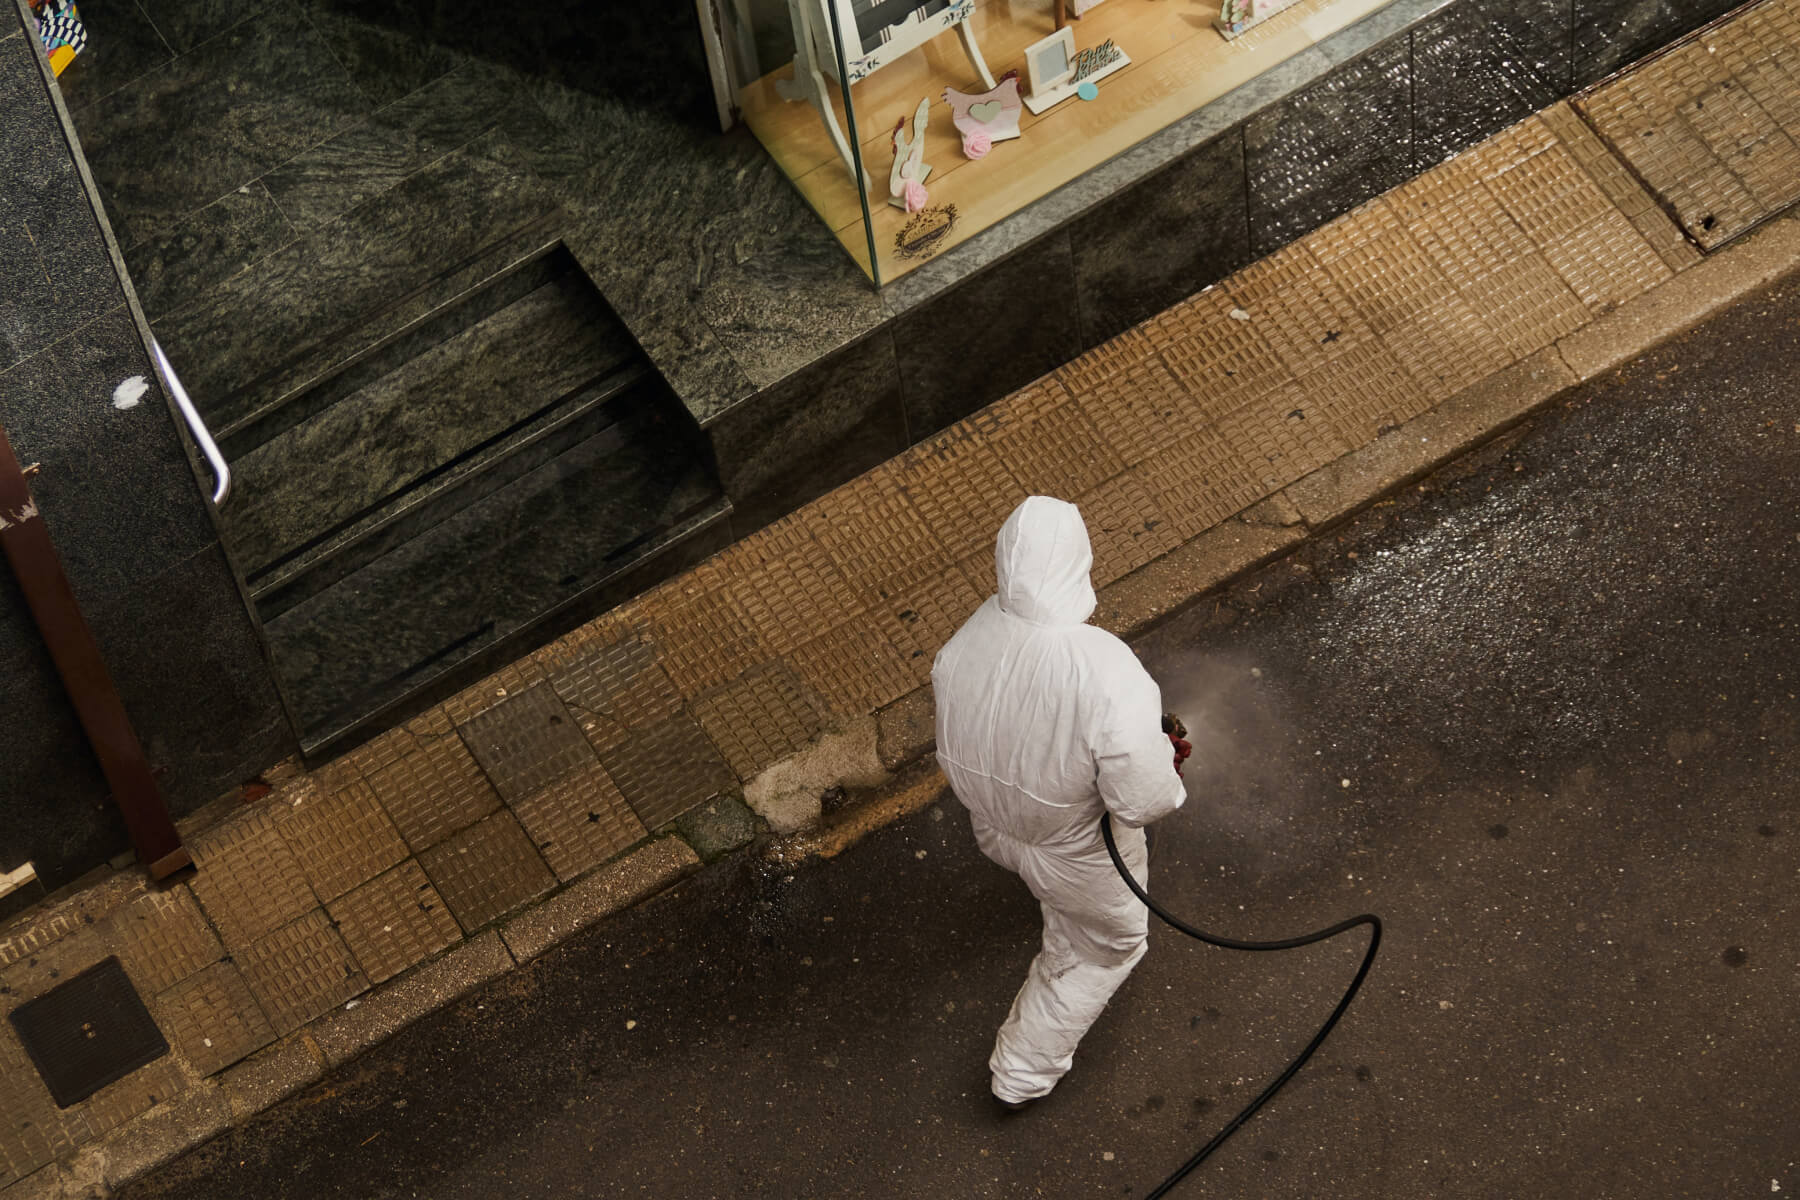 Дезинфекция улиц вИспании, 19марта 2020г. Фото: unsplash.com